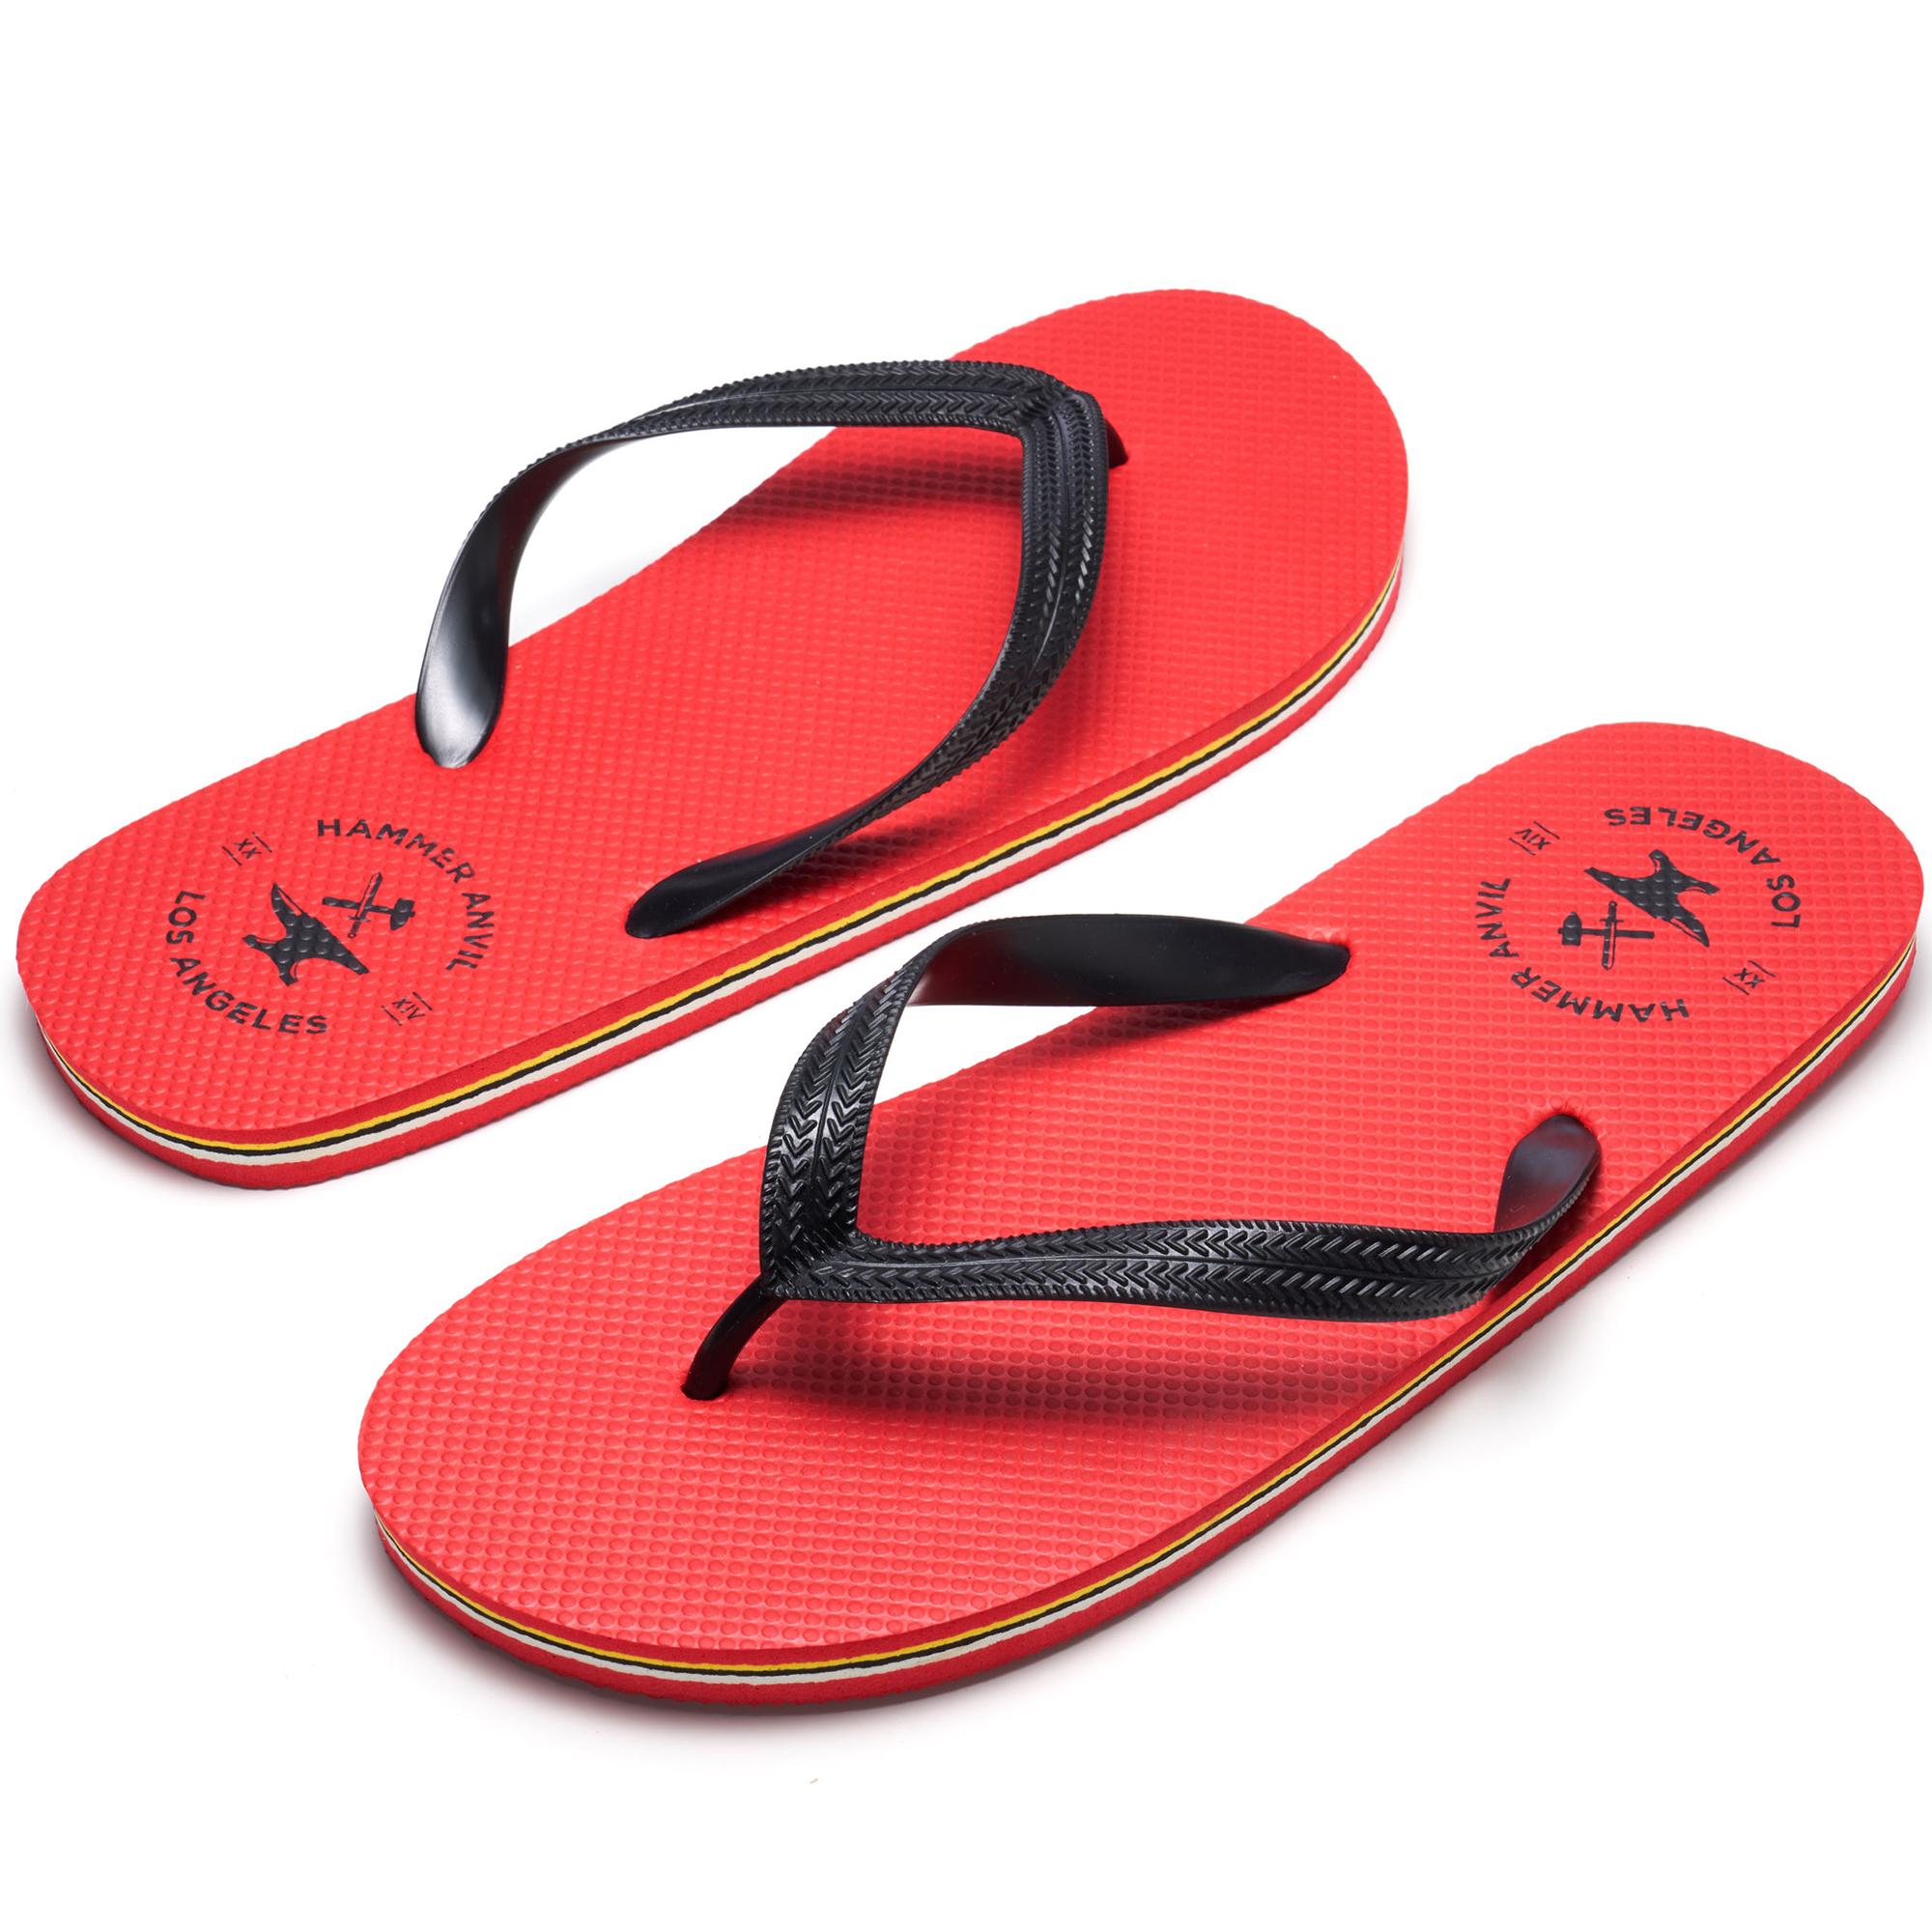 Hammer-Anvil-Mens-Flip-Flops-Casual-Thong-Summer-Sandals-Comfortable-Beach-Shoes thumbnail 42